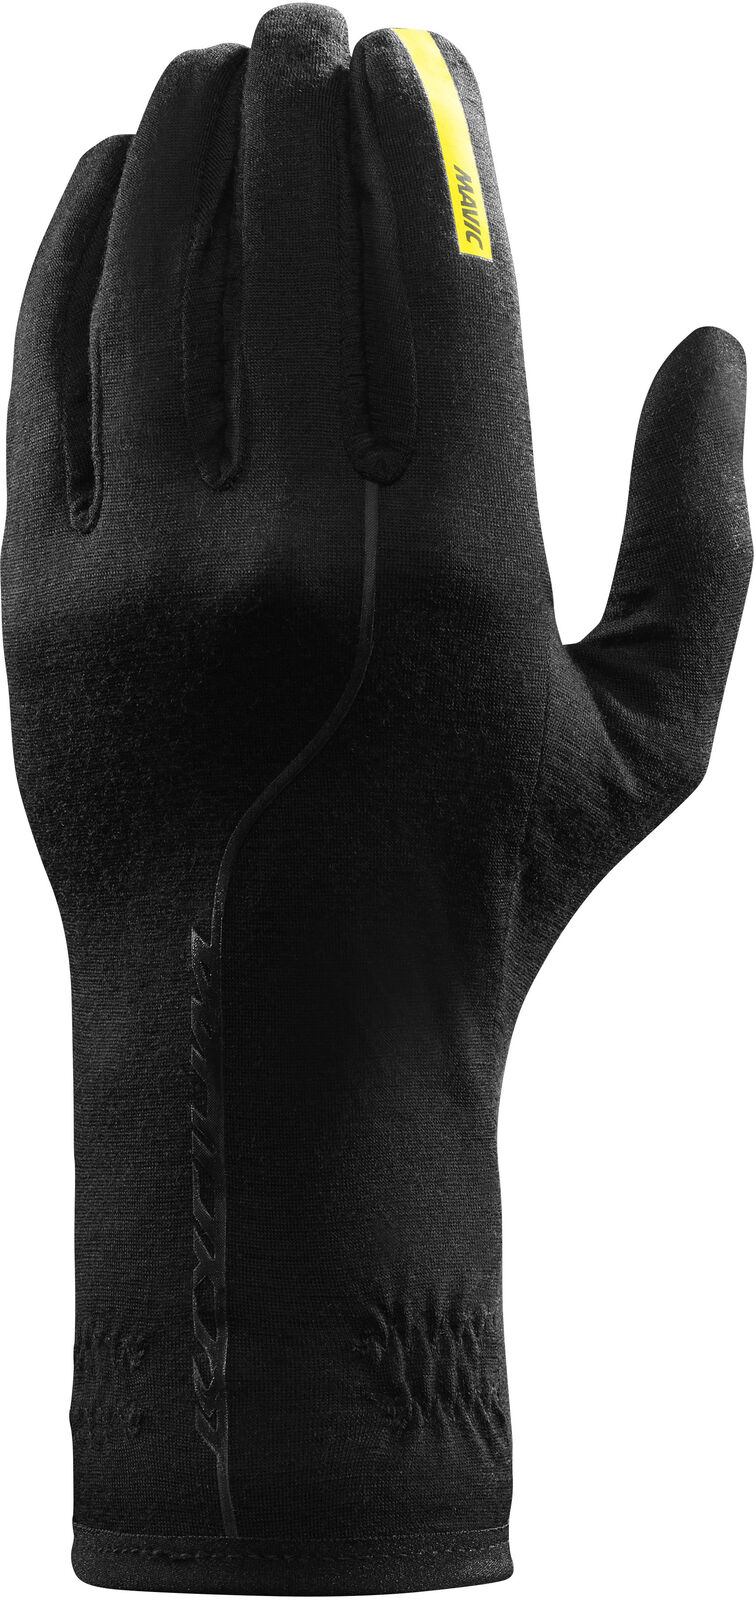 Mavic Ksyrium Merino Winter Fahrrad Handschuhe schwarz 2018